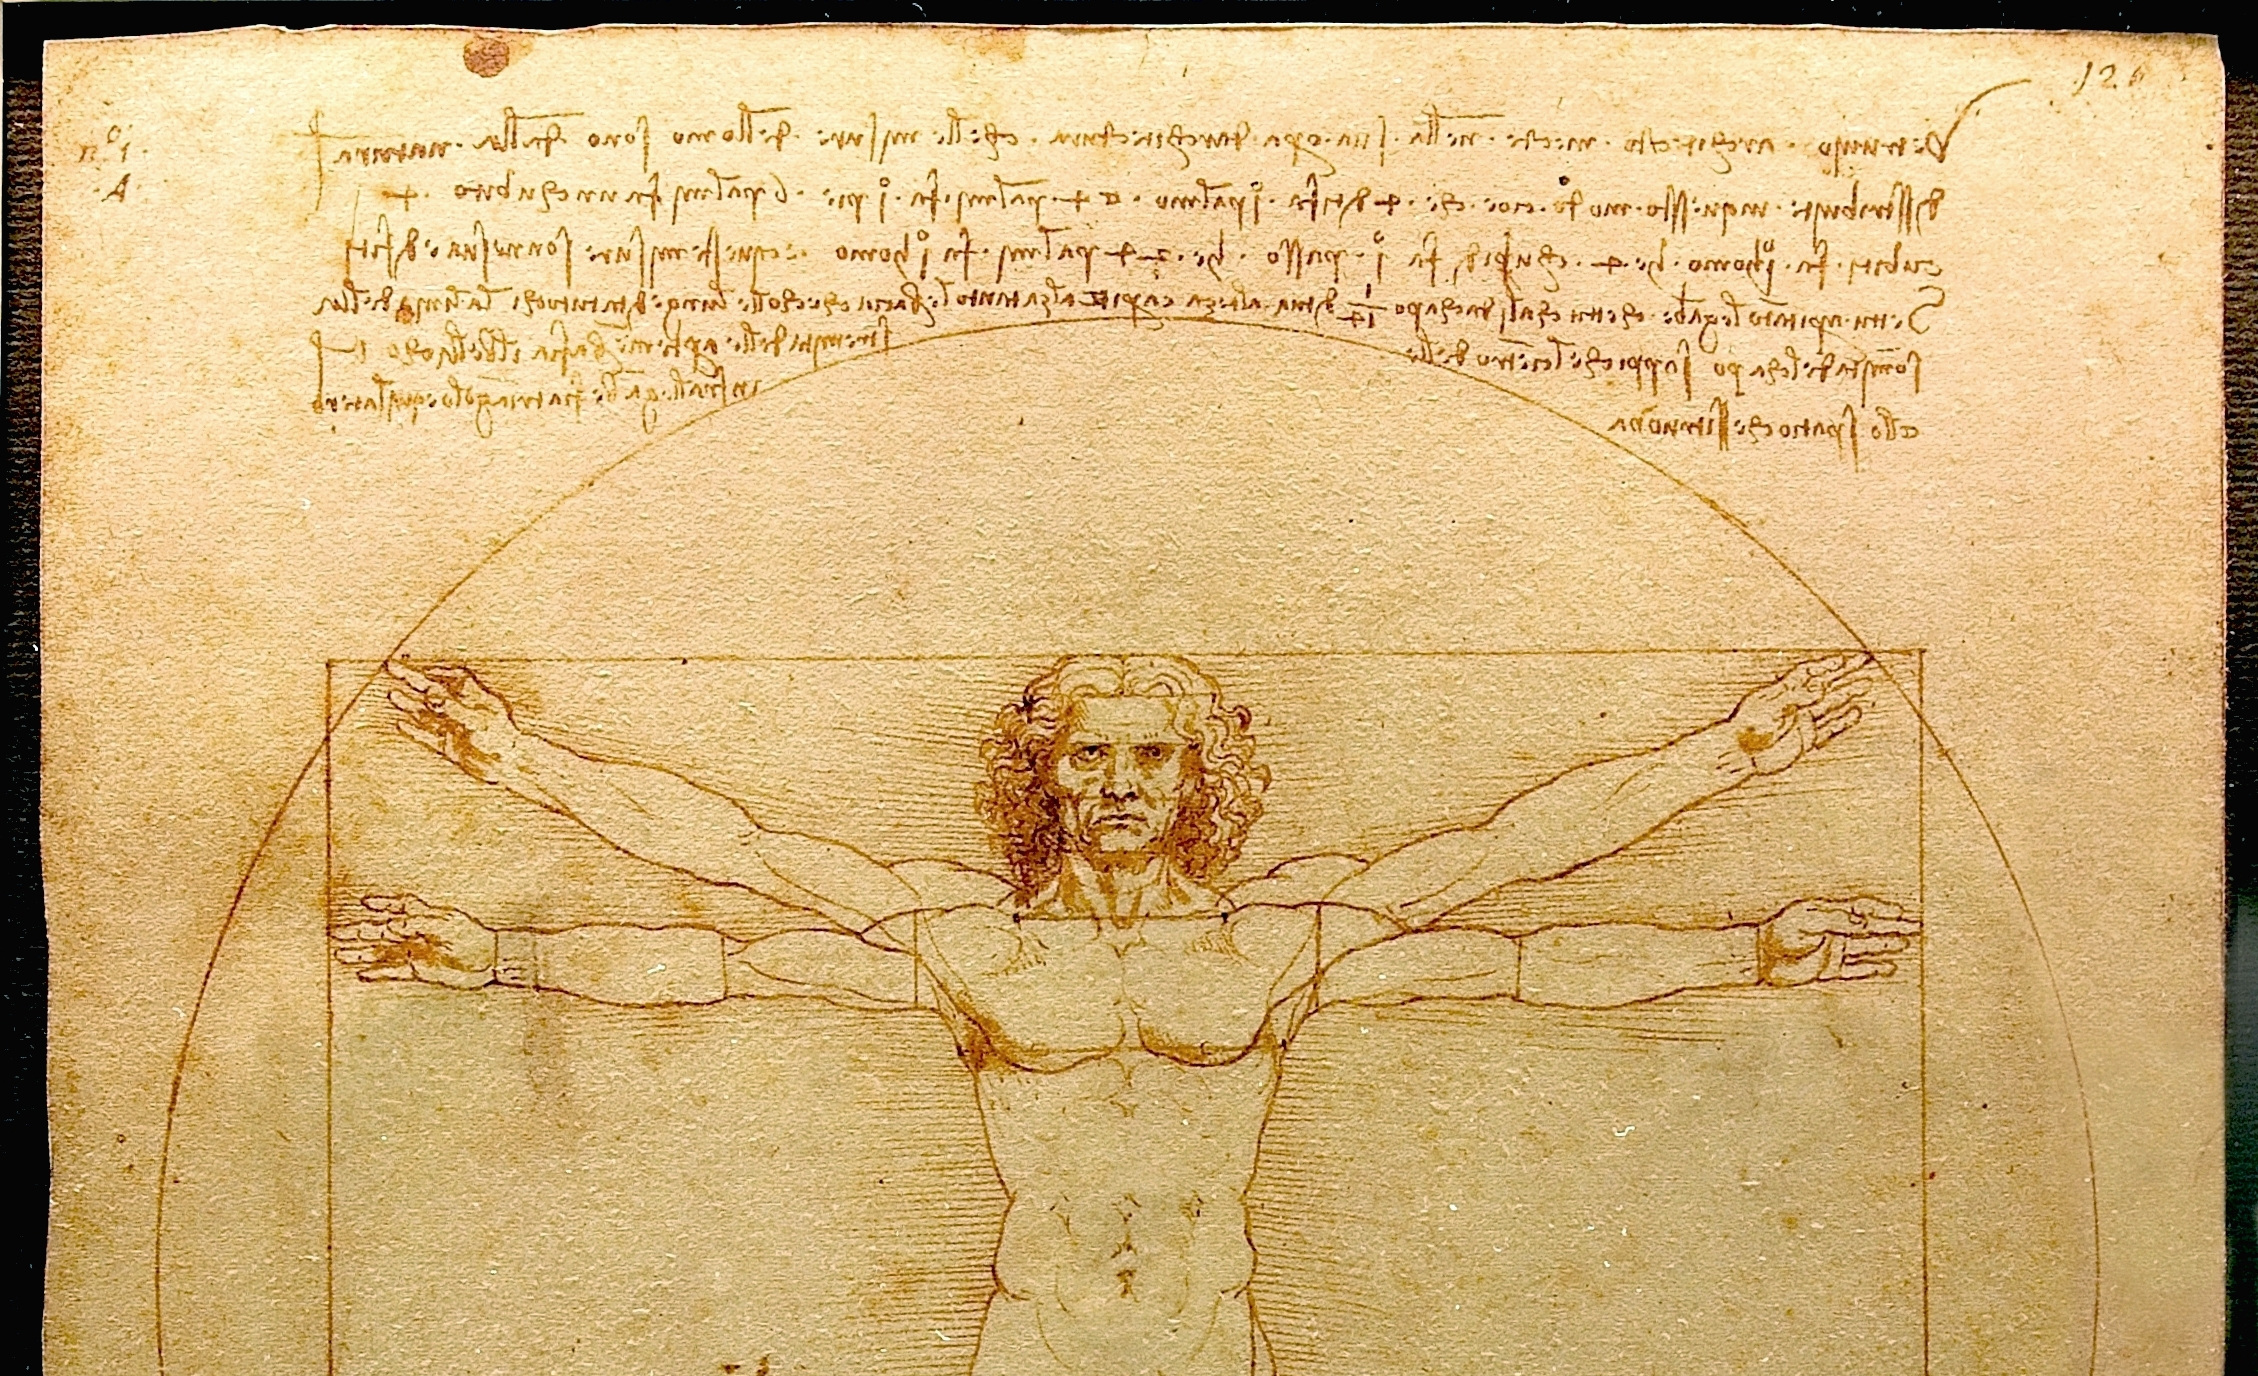 Leonardo Da Vinci's Vitruvian Man sketch (cropped so that facebook won't just show an image of a penis.)